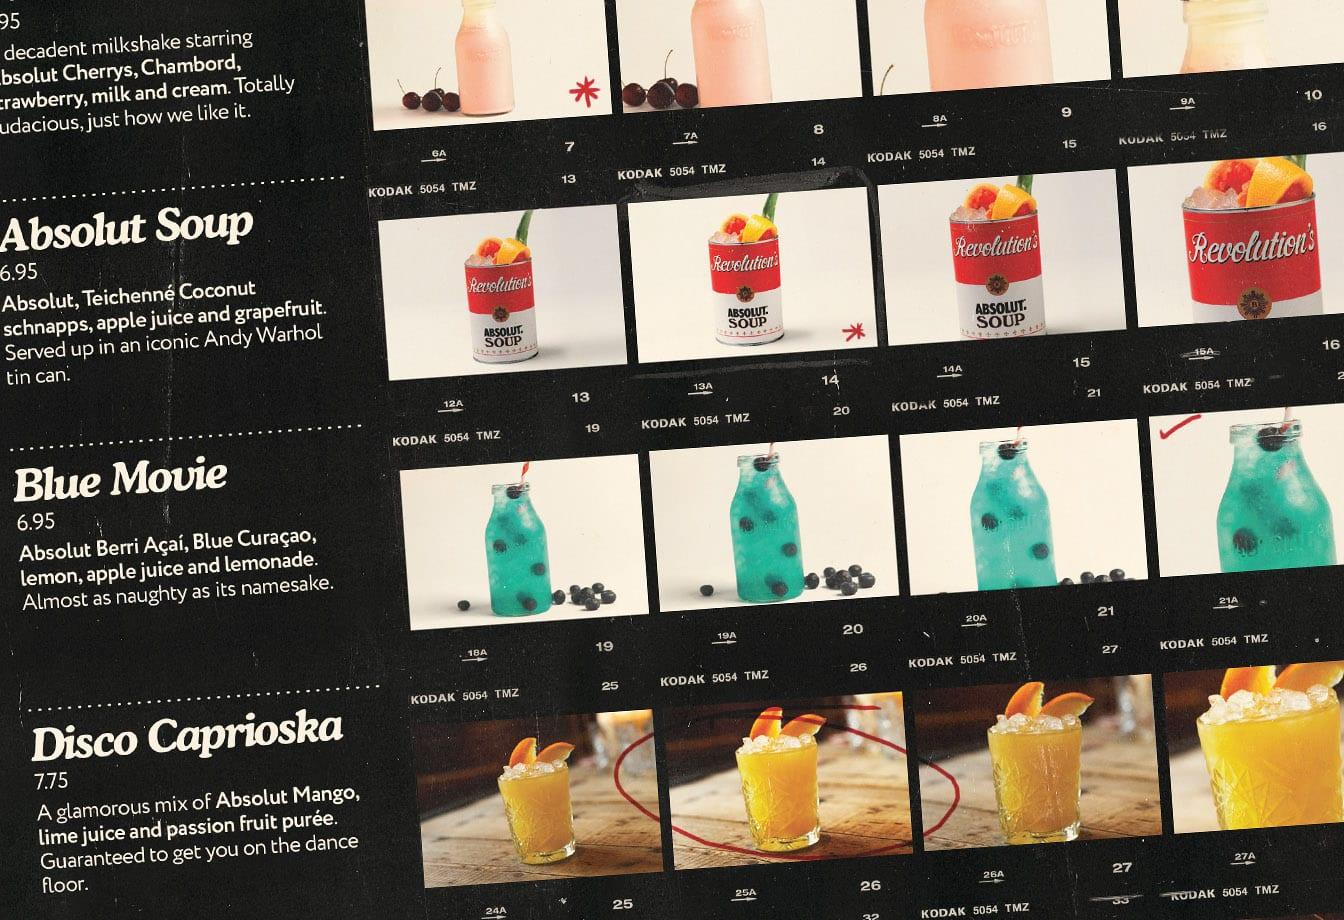 spirit of vodka specials absolut menu